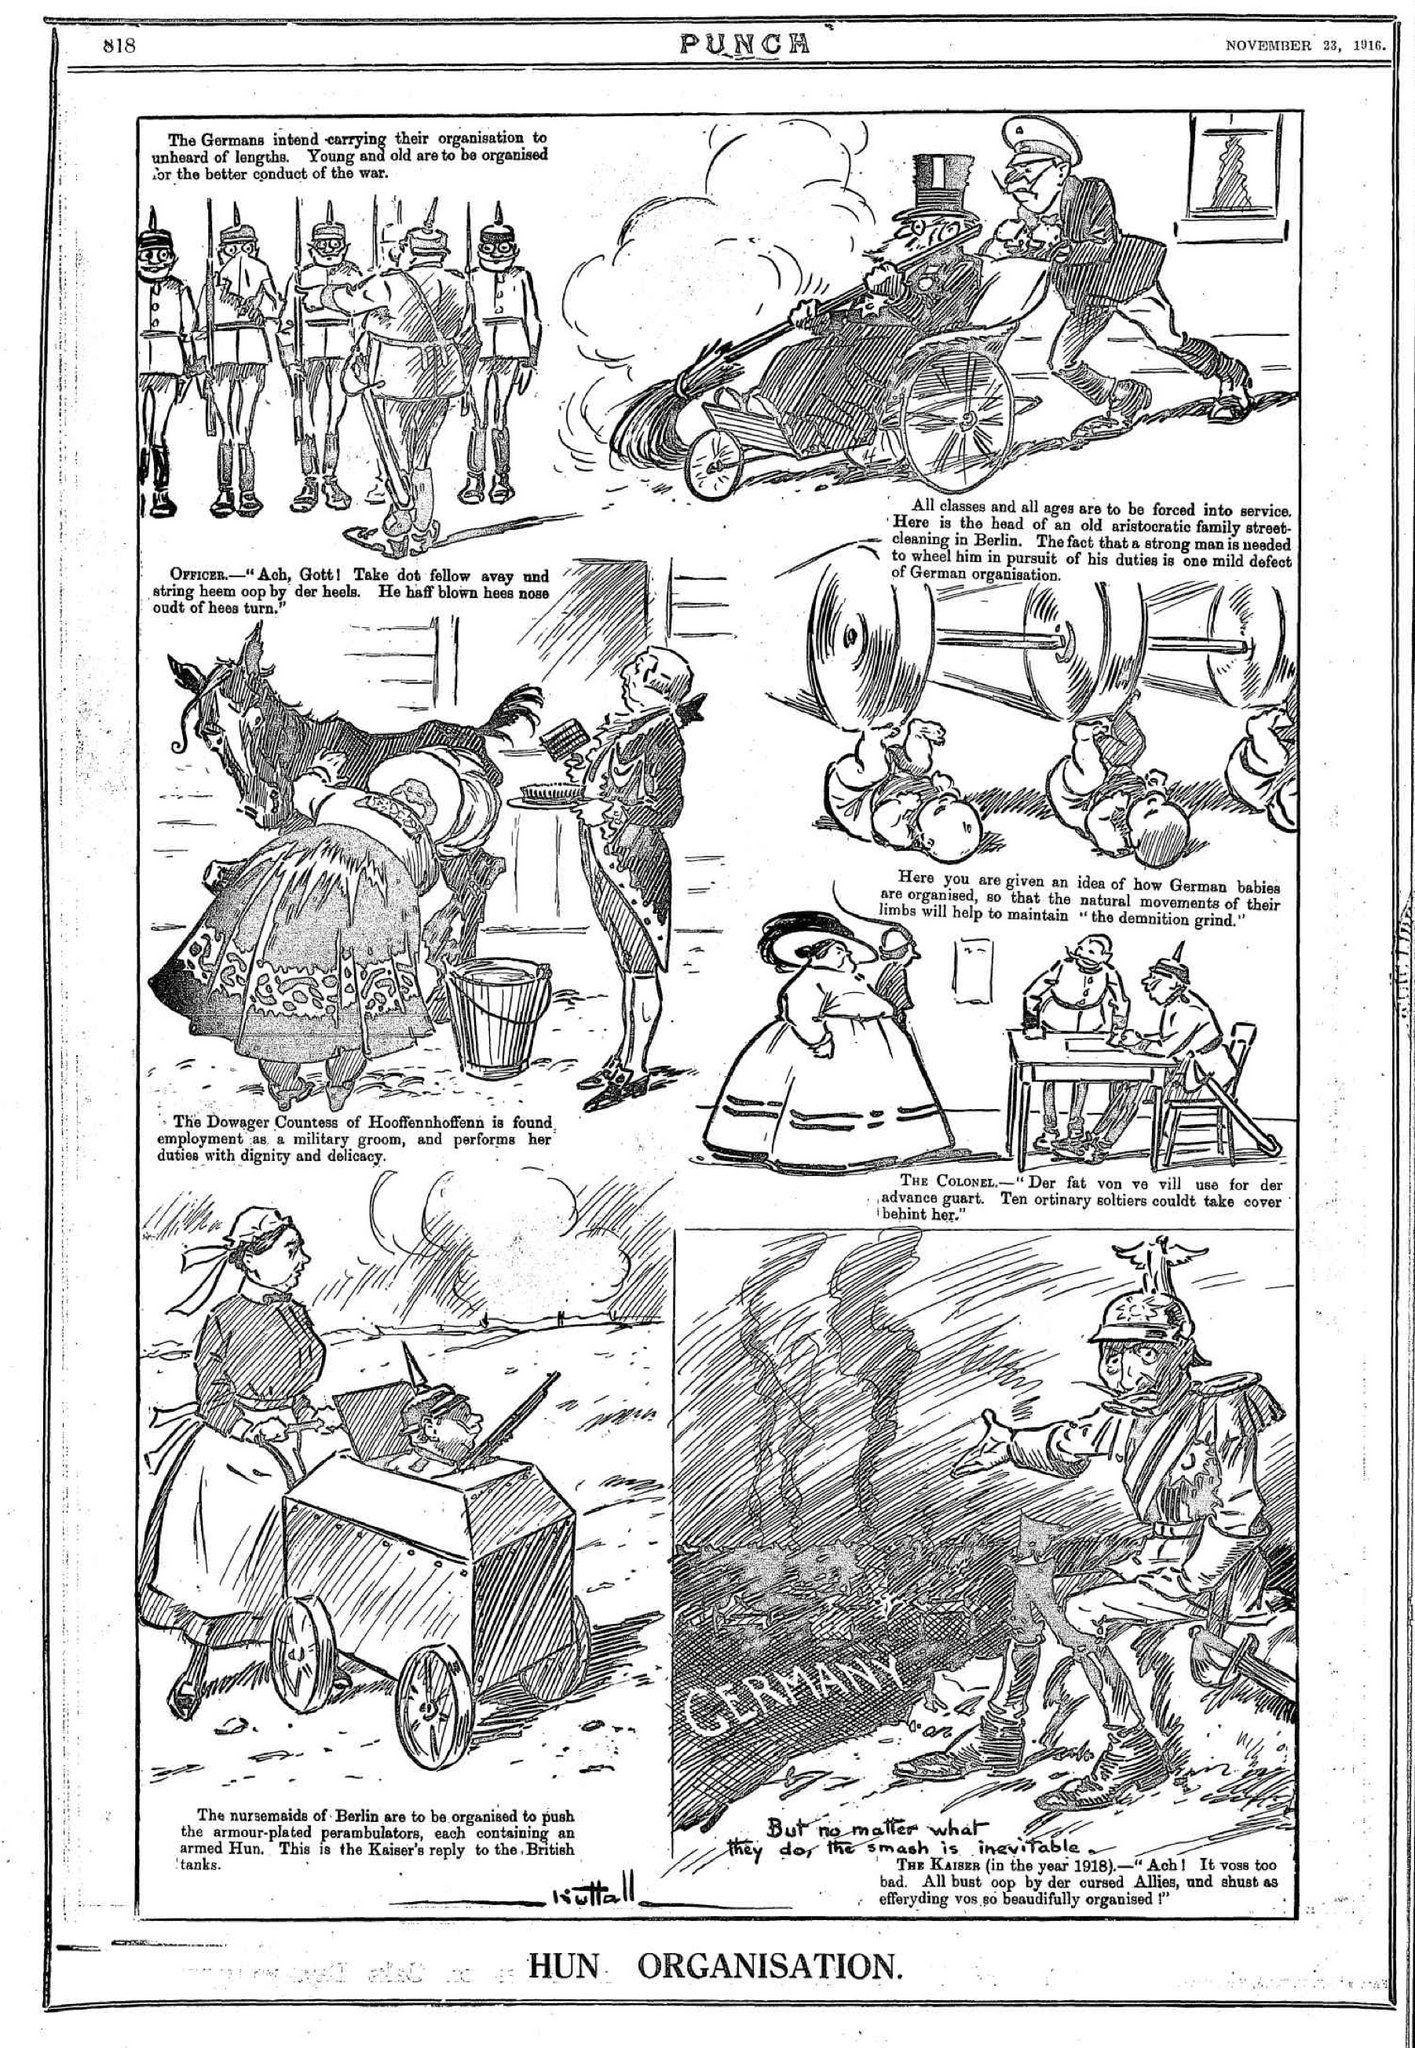 RT @FrontlineWW1: #WW1 Hun Organisation Punch (Melbourne) 23 Nov 1916 #ww1cartoon https://t.co/6eEdcj9shG